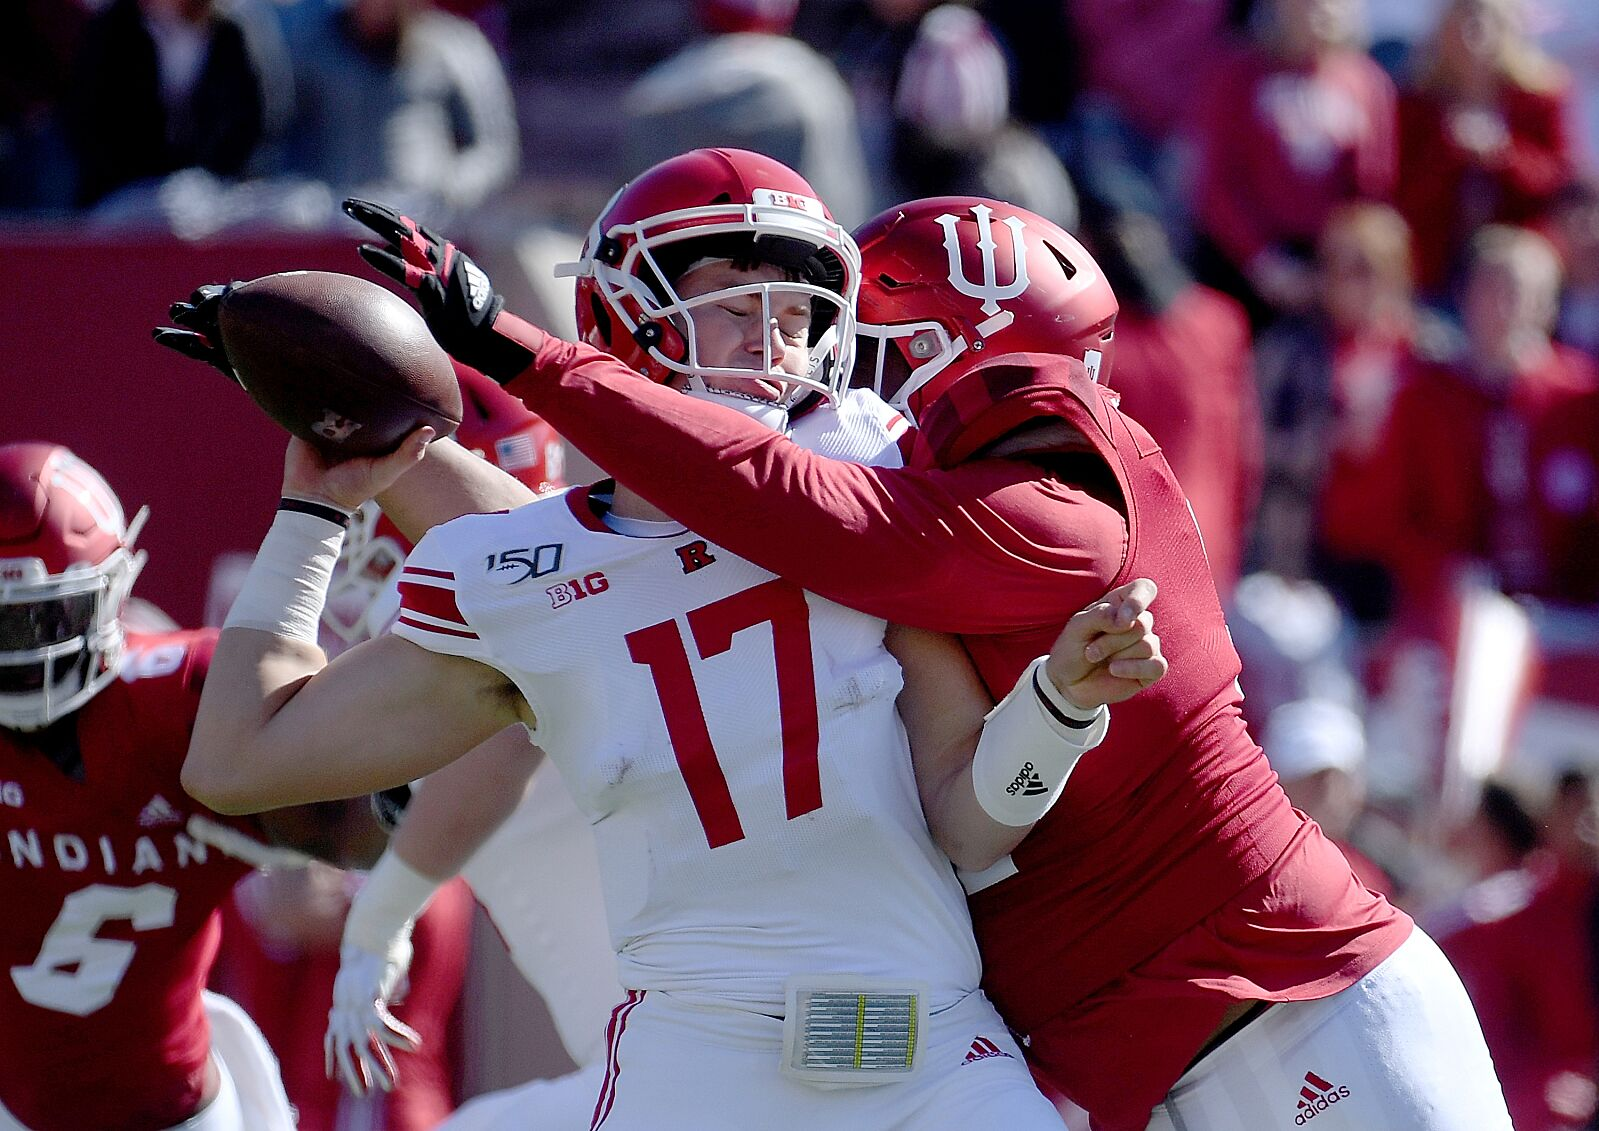 Rutgers-centric Big Ten Football Power Rankings Week 7, 2019